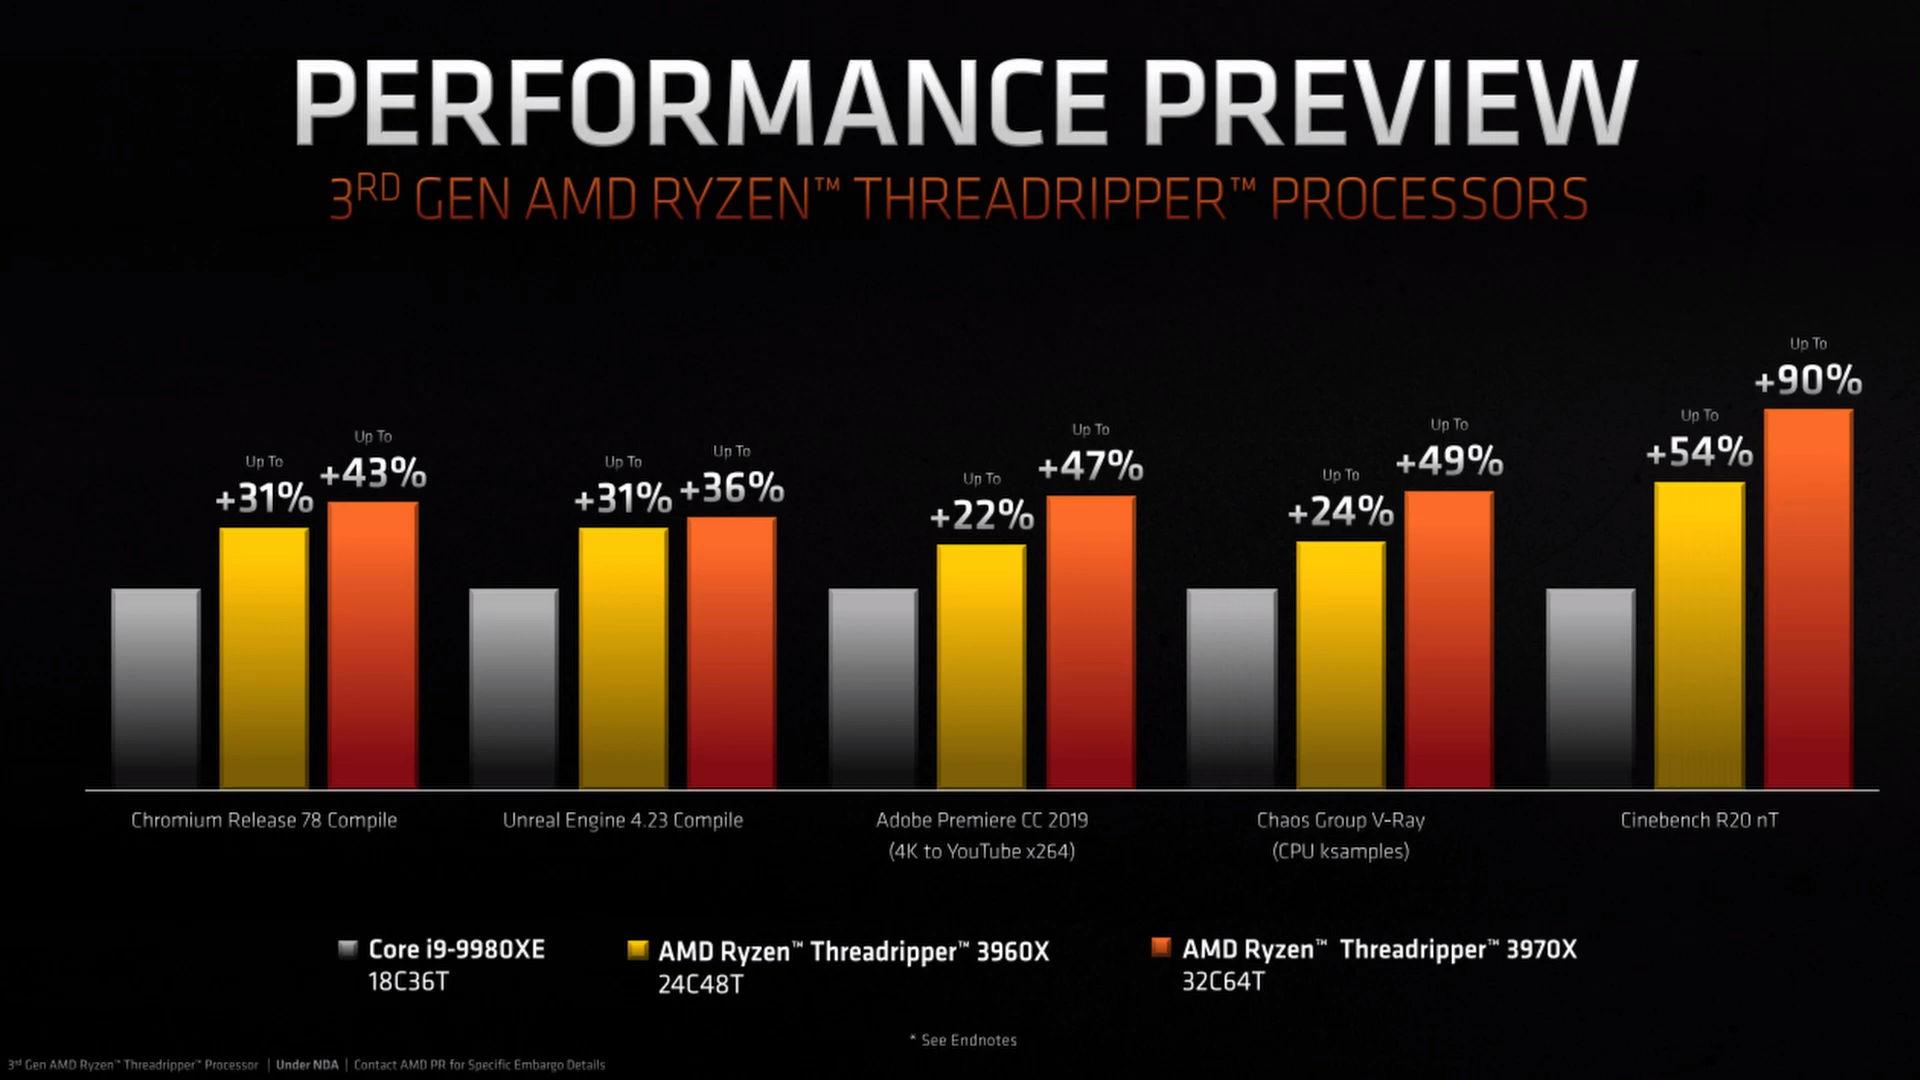 Threadripper 3960X and 3970X Performance